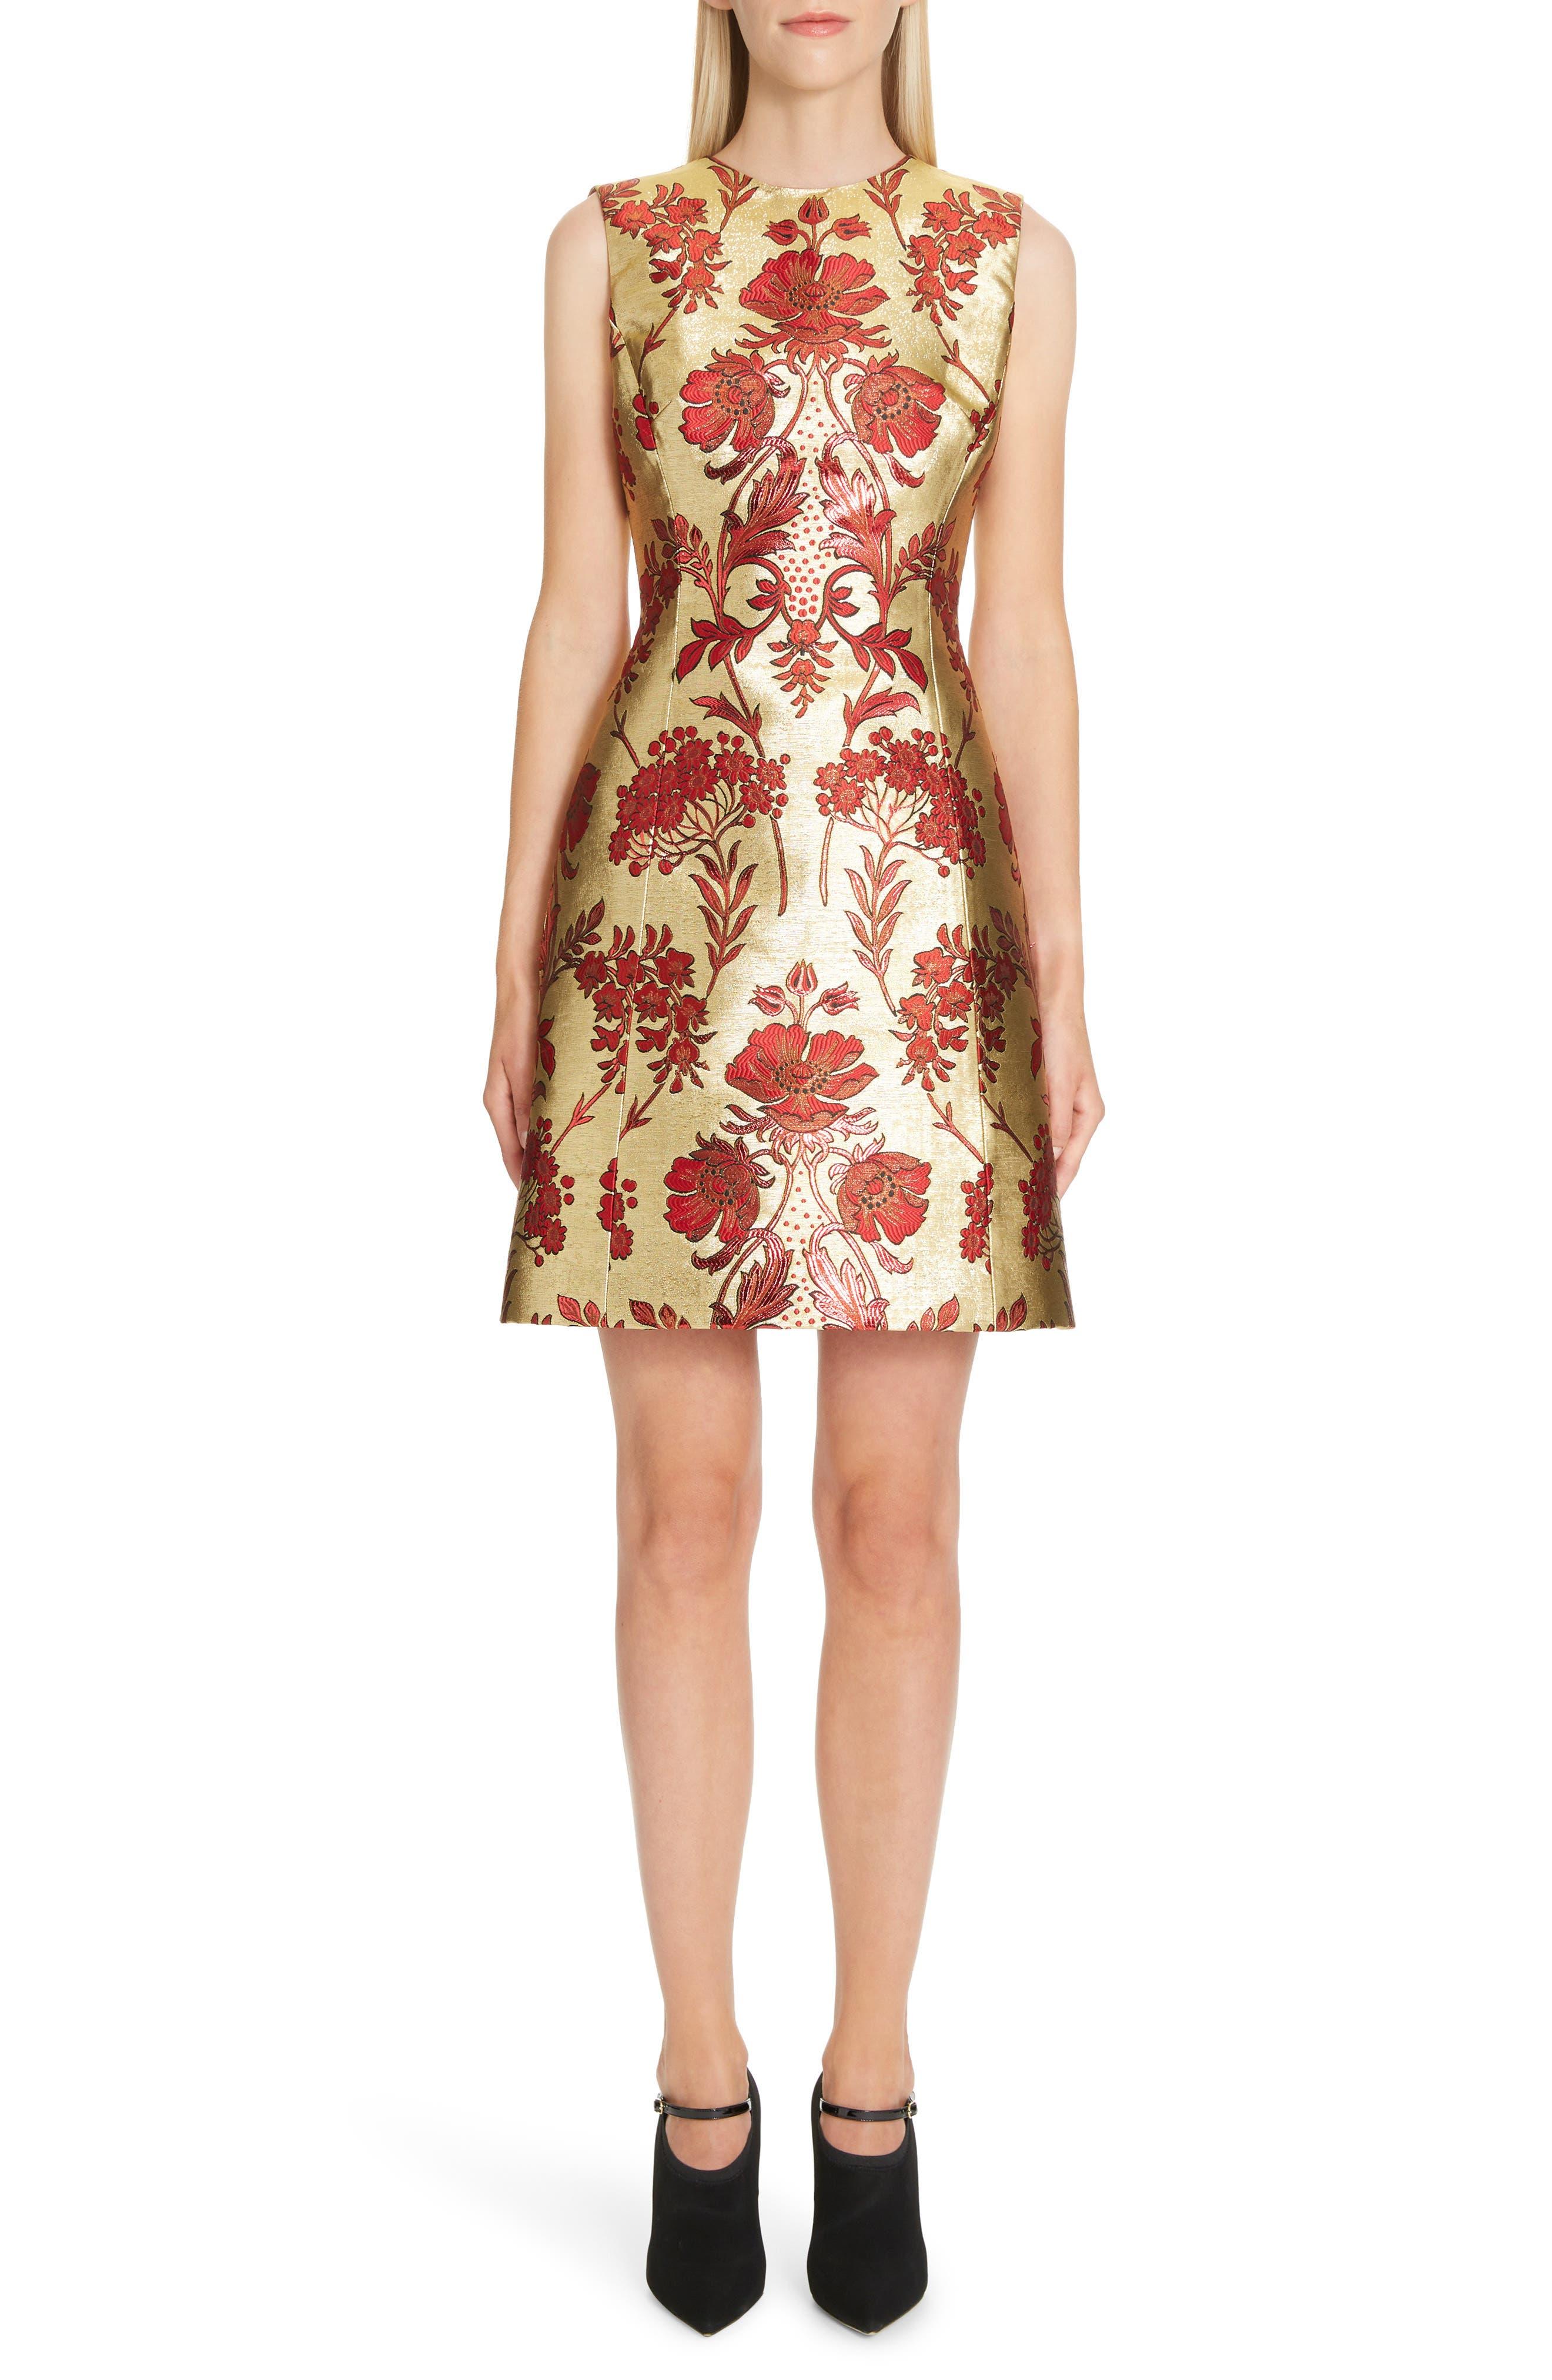 Dolce & gabbana Metallic Jacquard A-Line Dress, US / 40 IT - Metallic